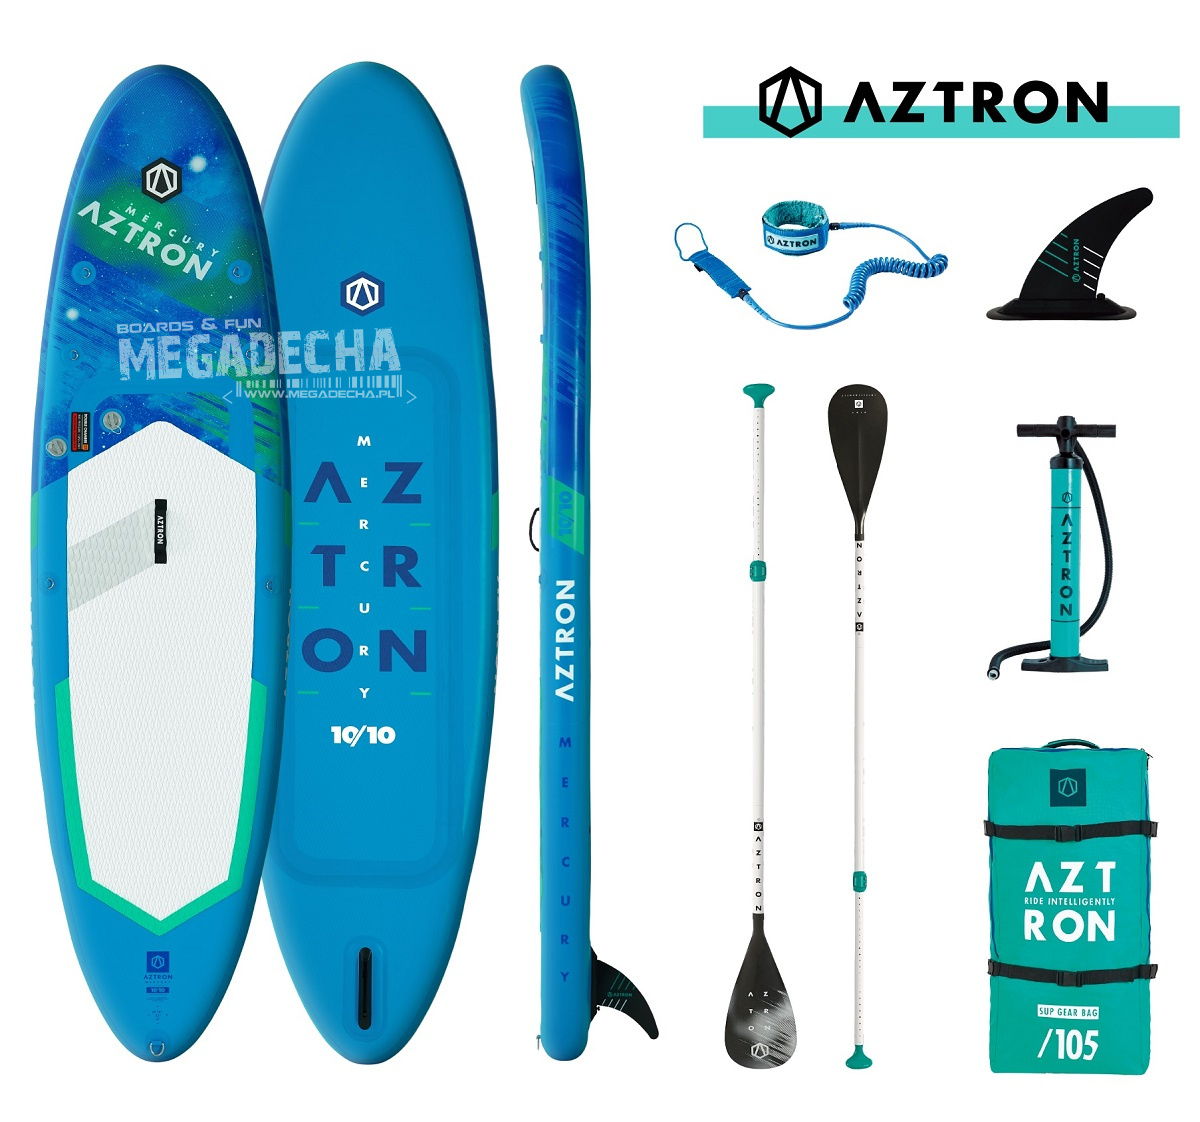 Deska SUP board Aztron Mercury